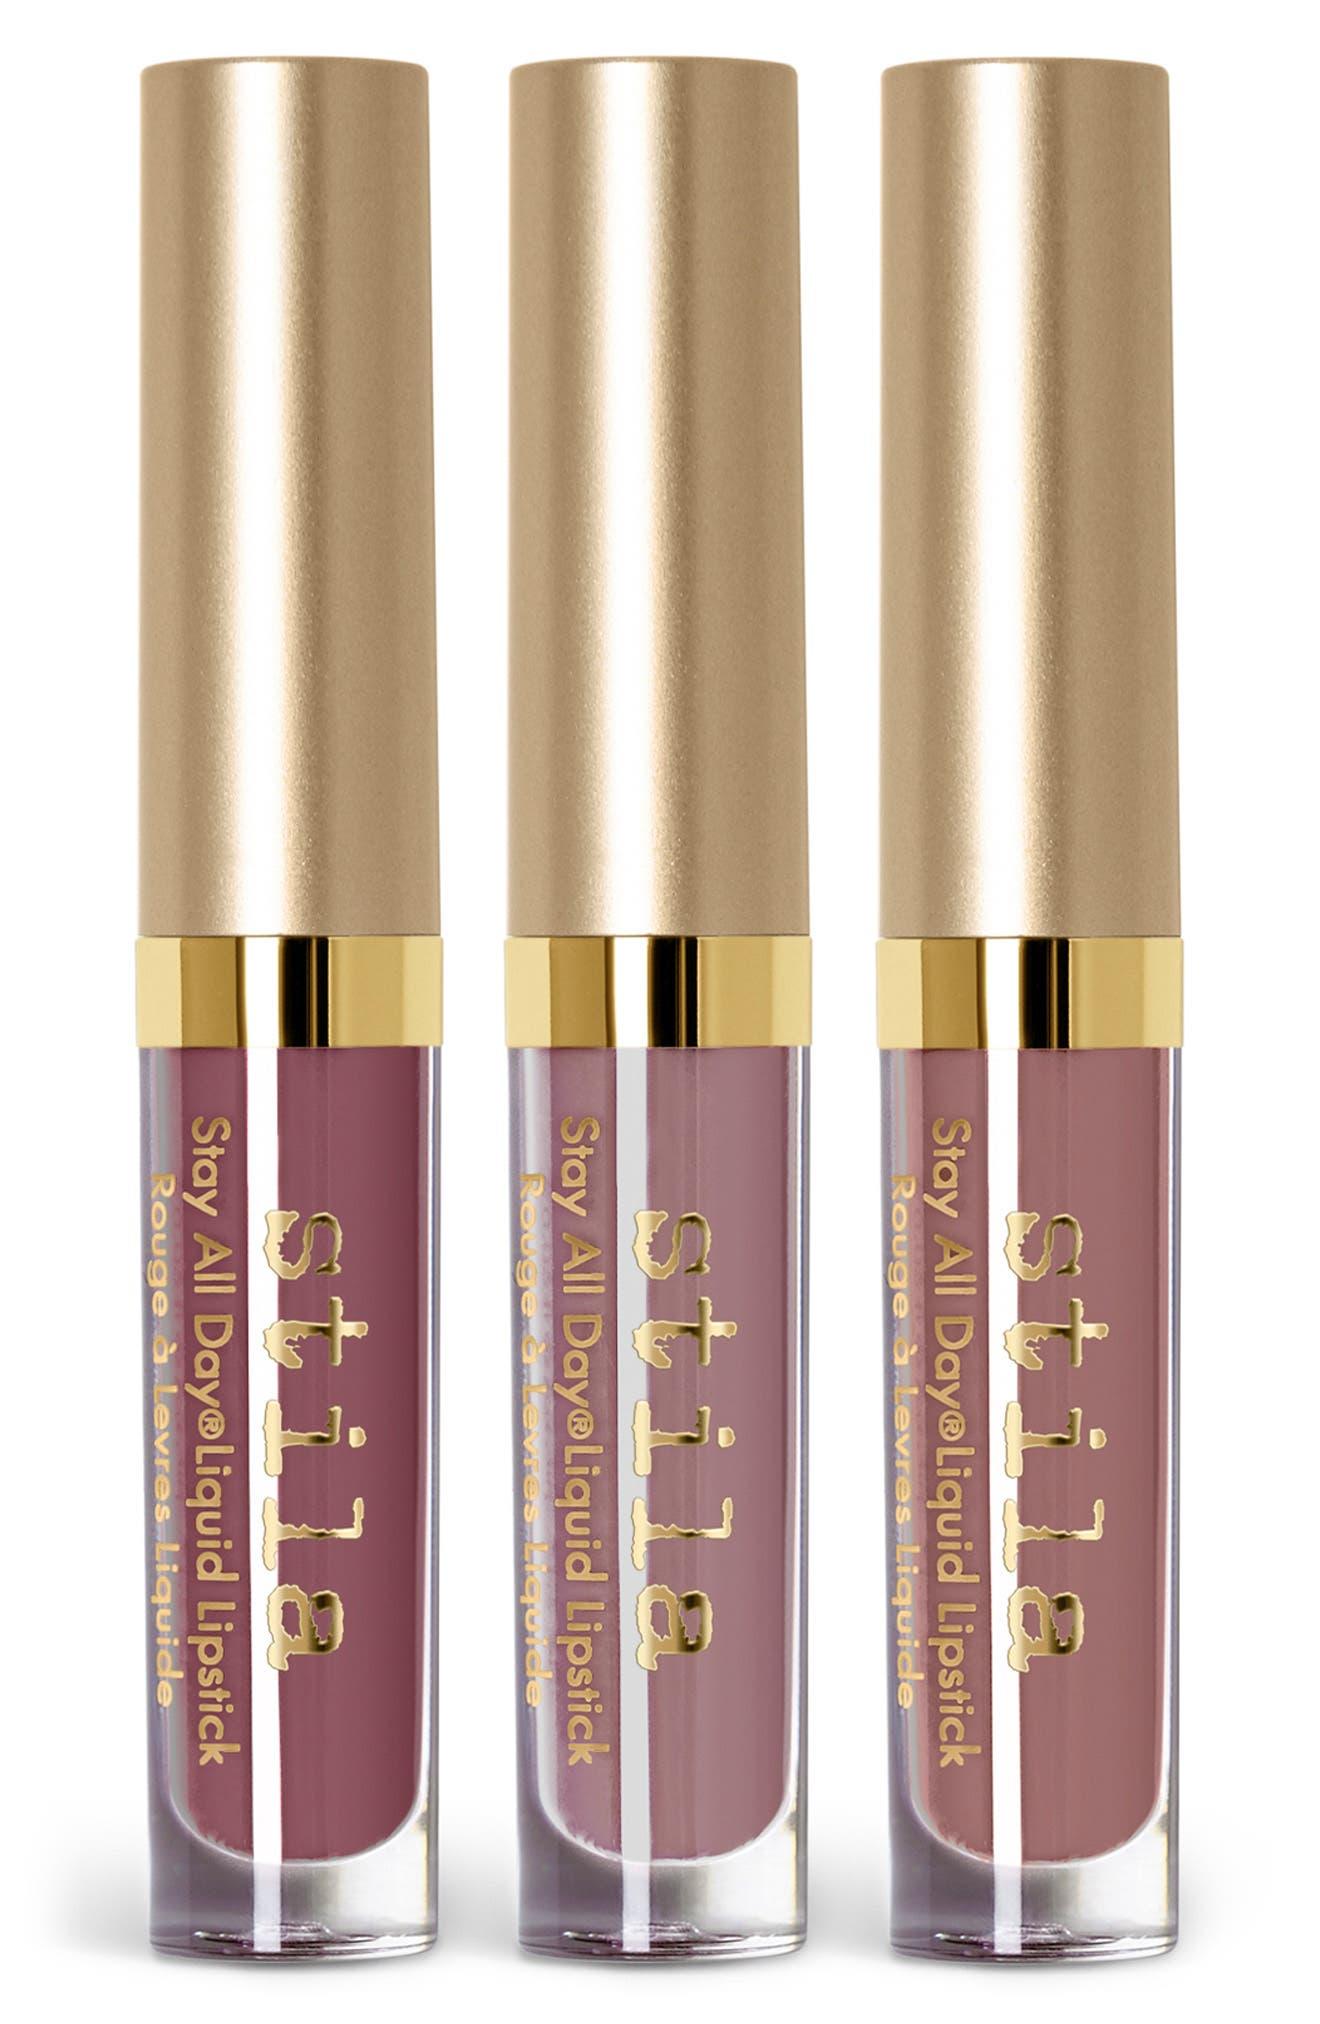 Bold & Bare Stay All Day® Liquid Lipstick Set-$36 Value   Nordstrom